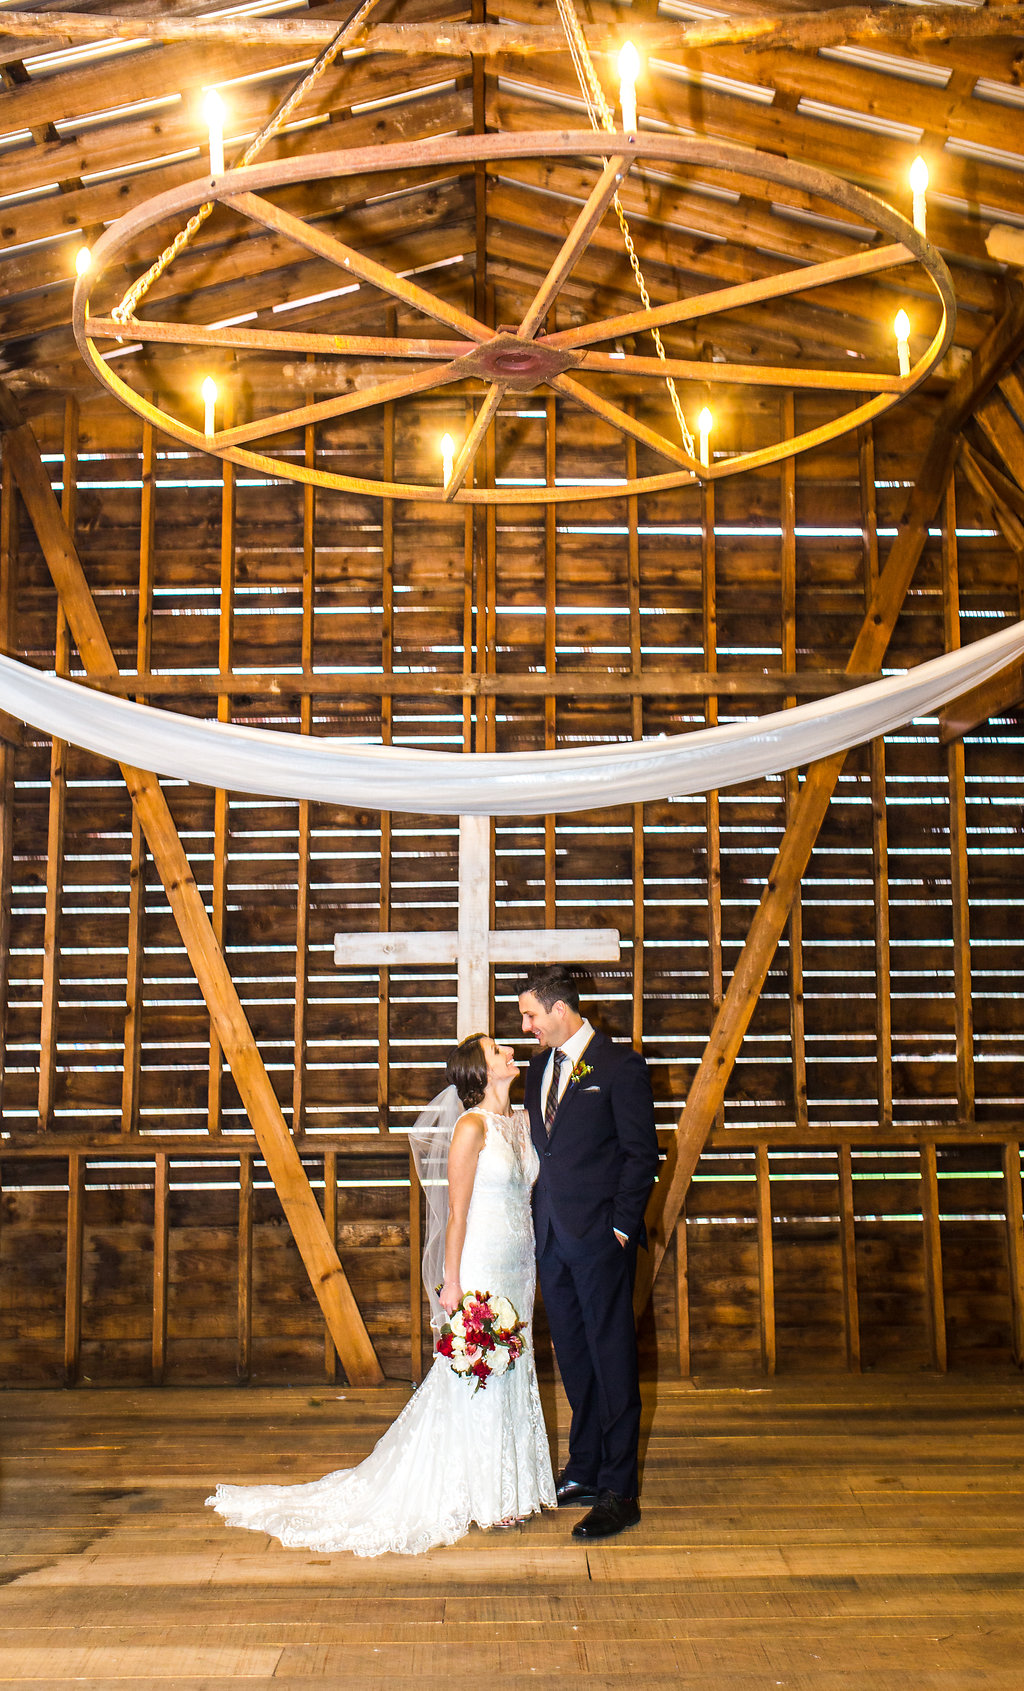 Honeysuckle-Hill-Asheville-Wedding-Venue-Chase-Chris-Elopement-228.JPG